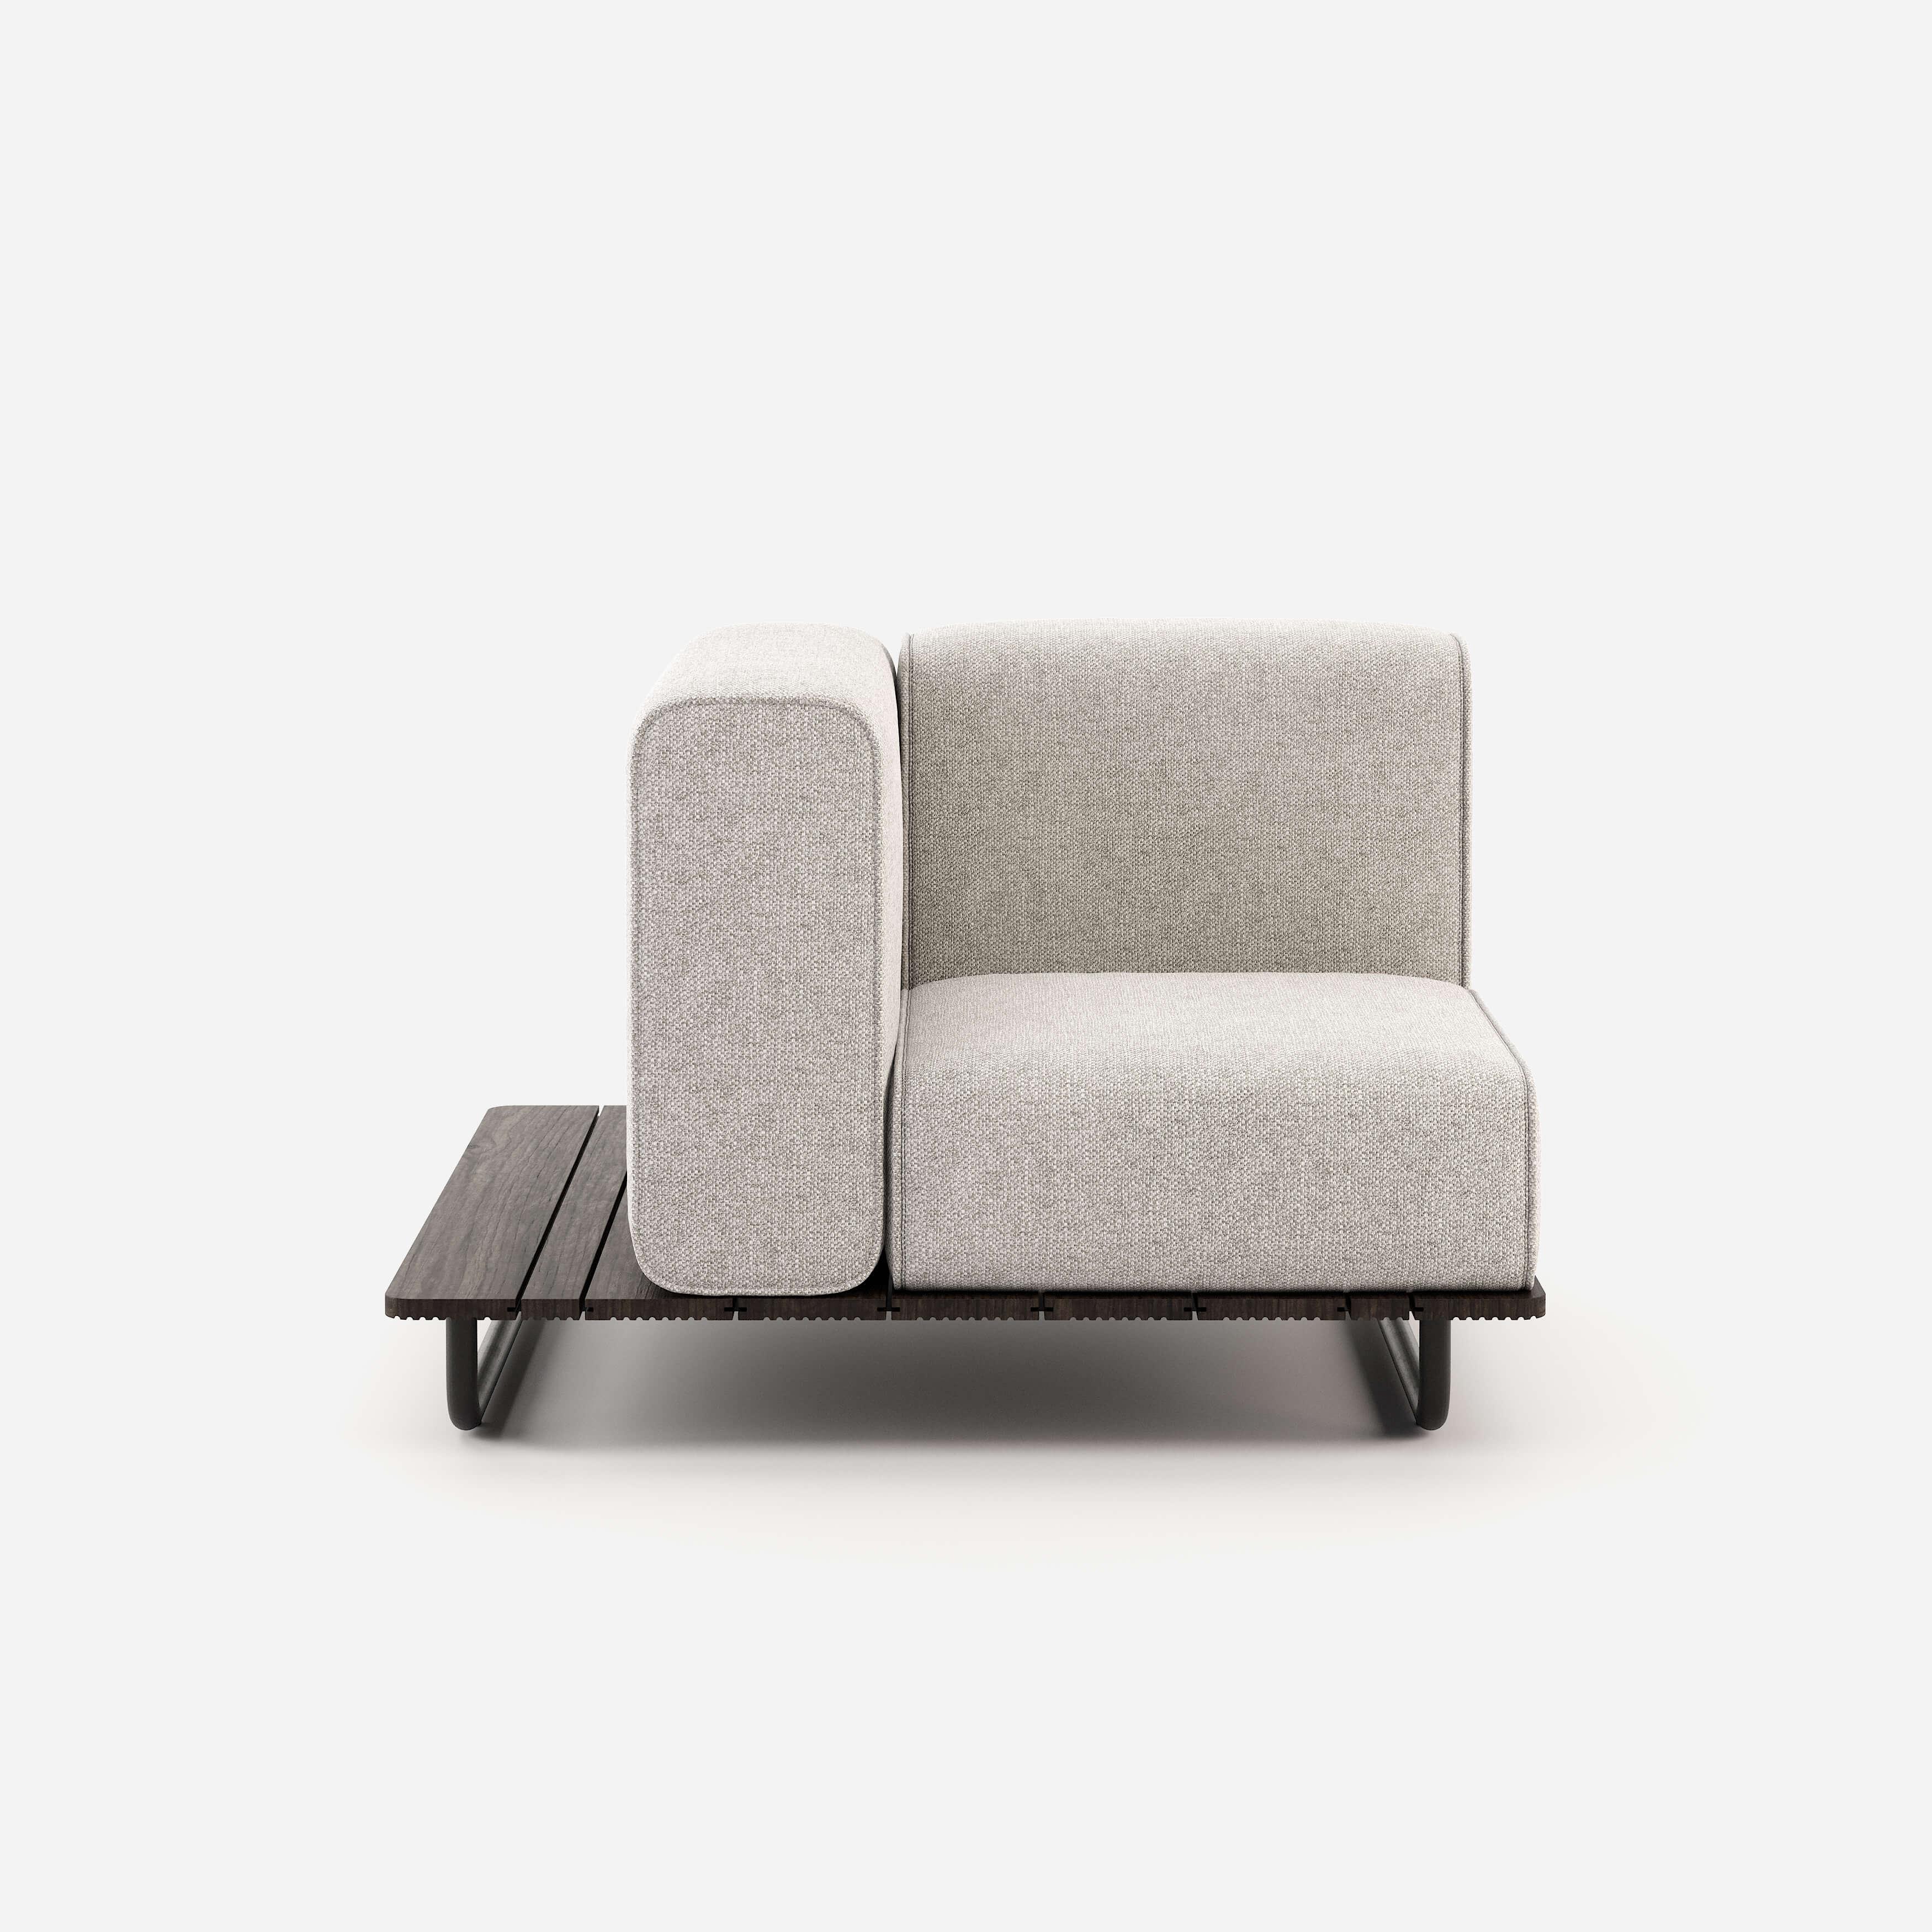 Copacabana-Left-Armrest-outdoor-collection-domkapa-white-furniture-interior-design-home-decor-domkapa-upholstery-2